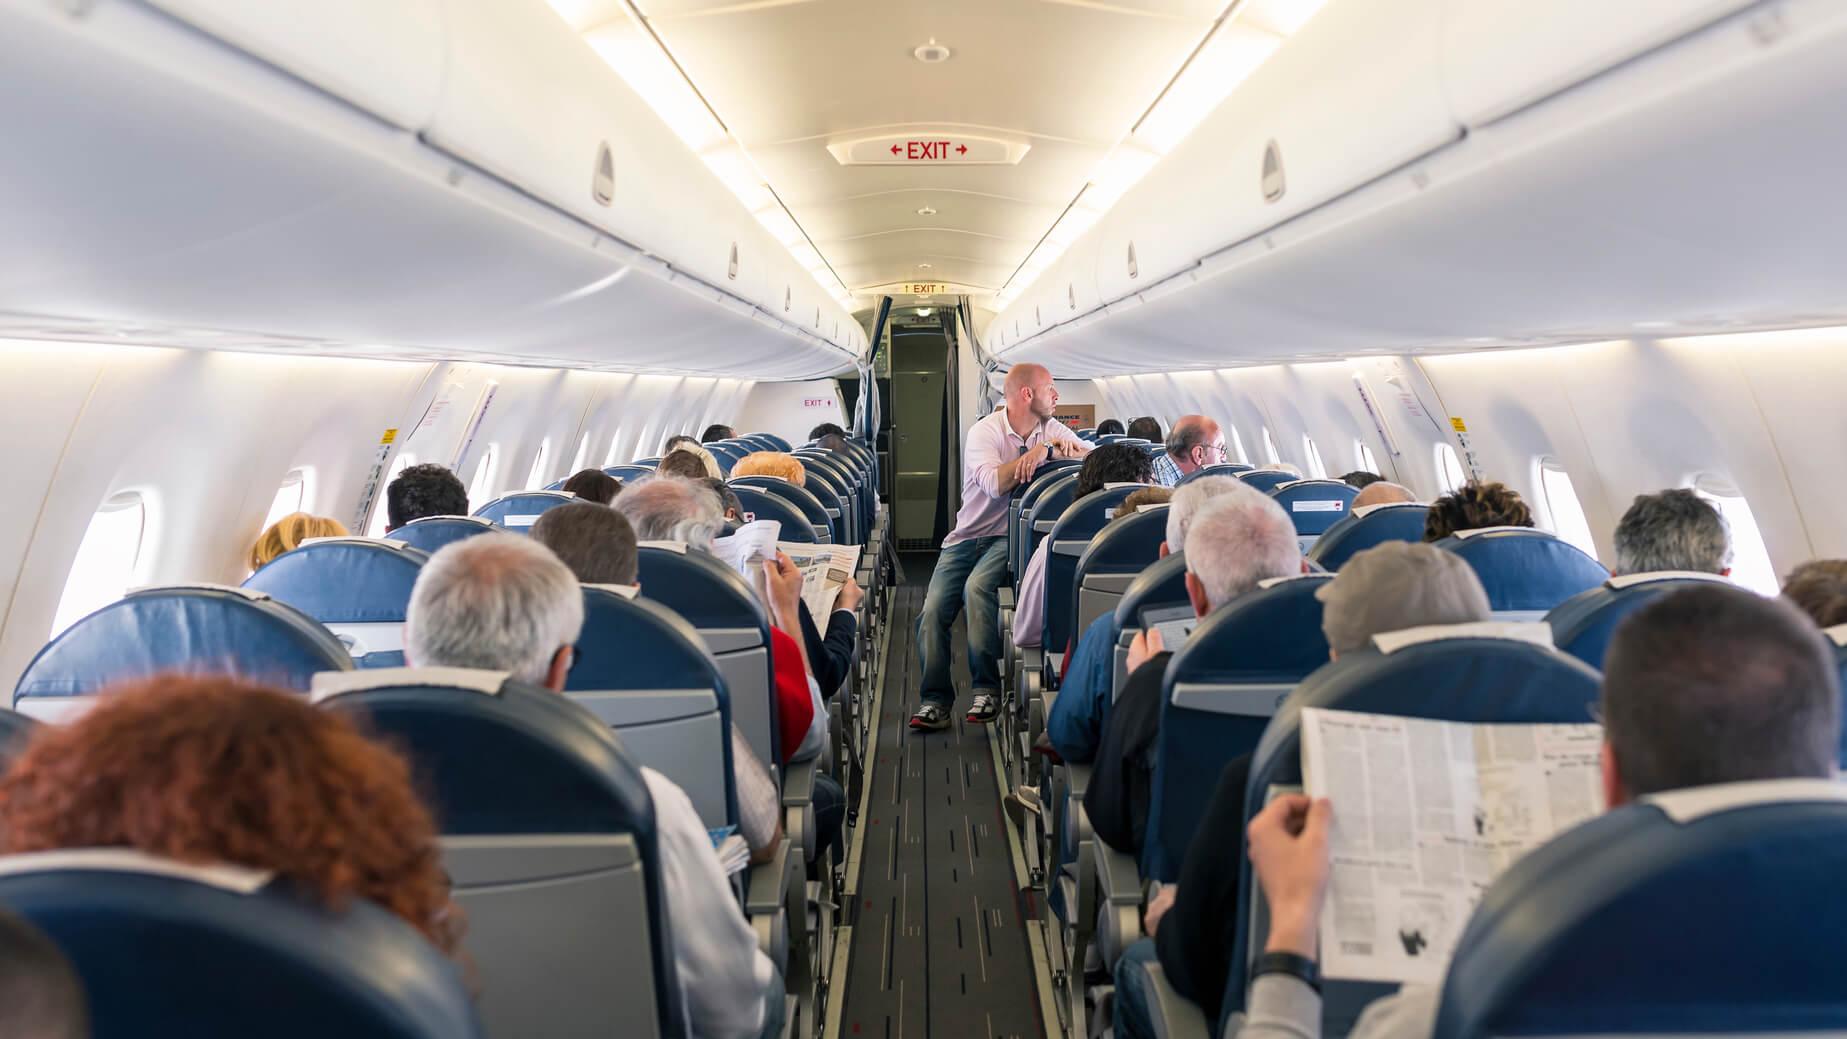 Pasajeros arriba de un avión